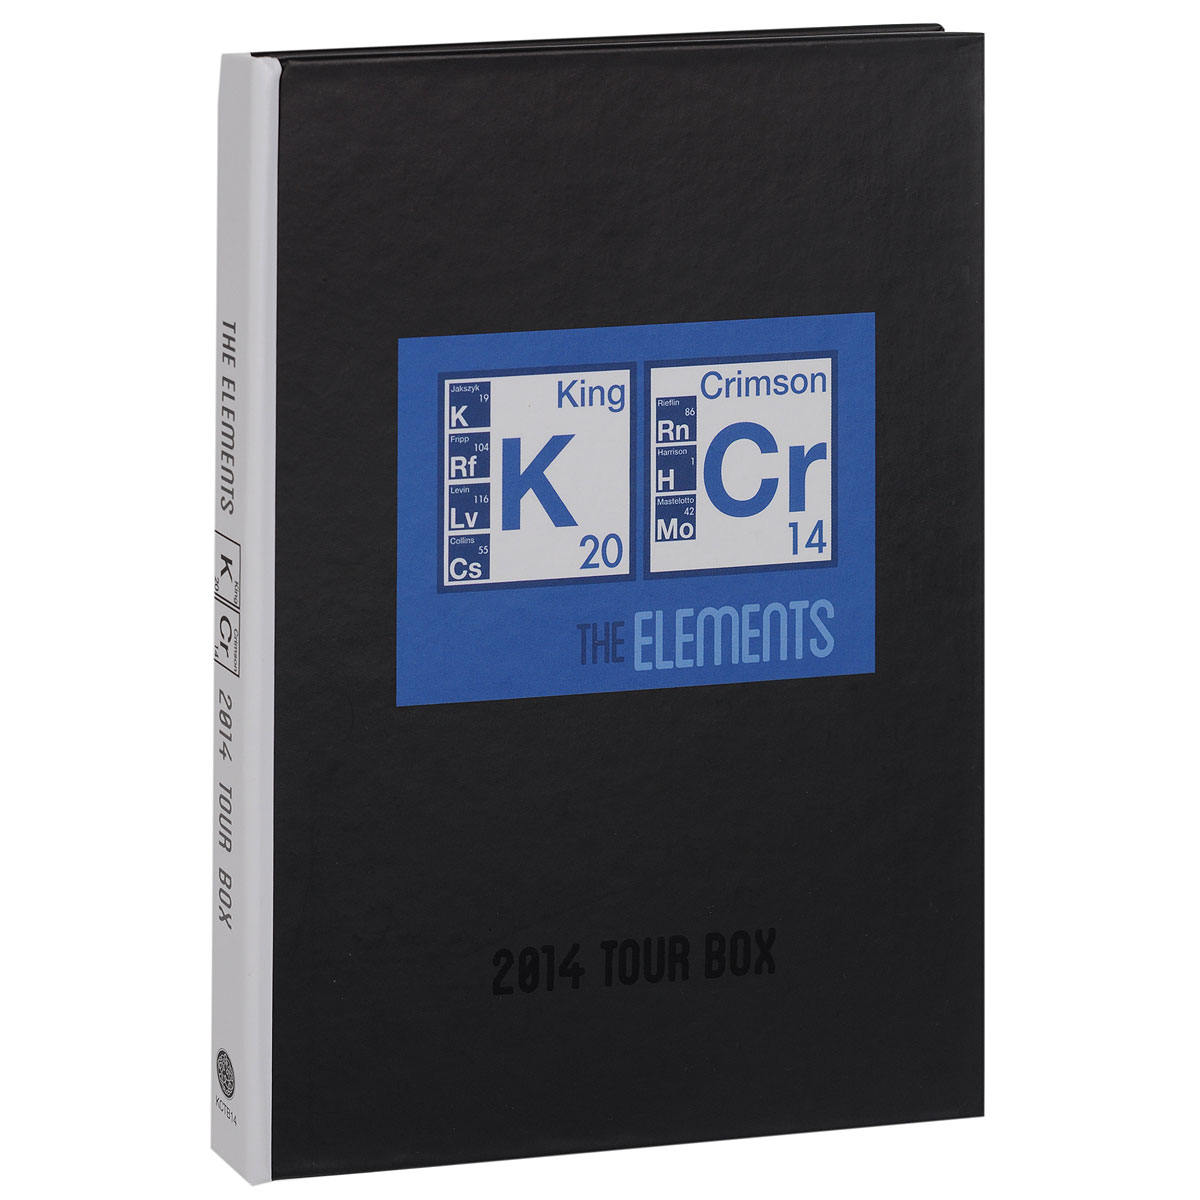 King Crimson King Crimson. The Elements (2 CD) king crimson king crimson starless 40th anniversary series 23 cd 2 dvd 2 blu ray